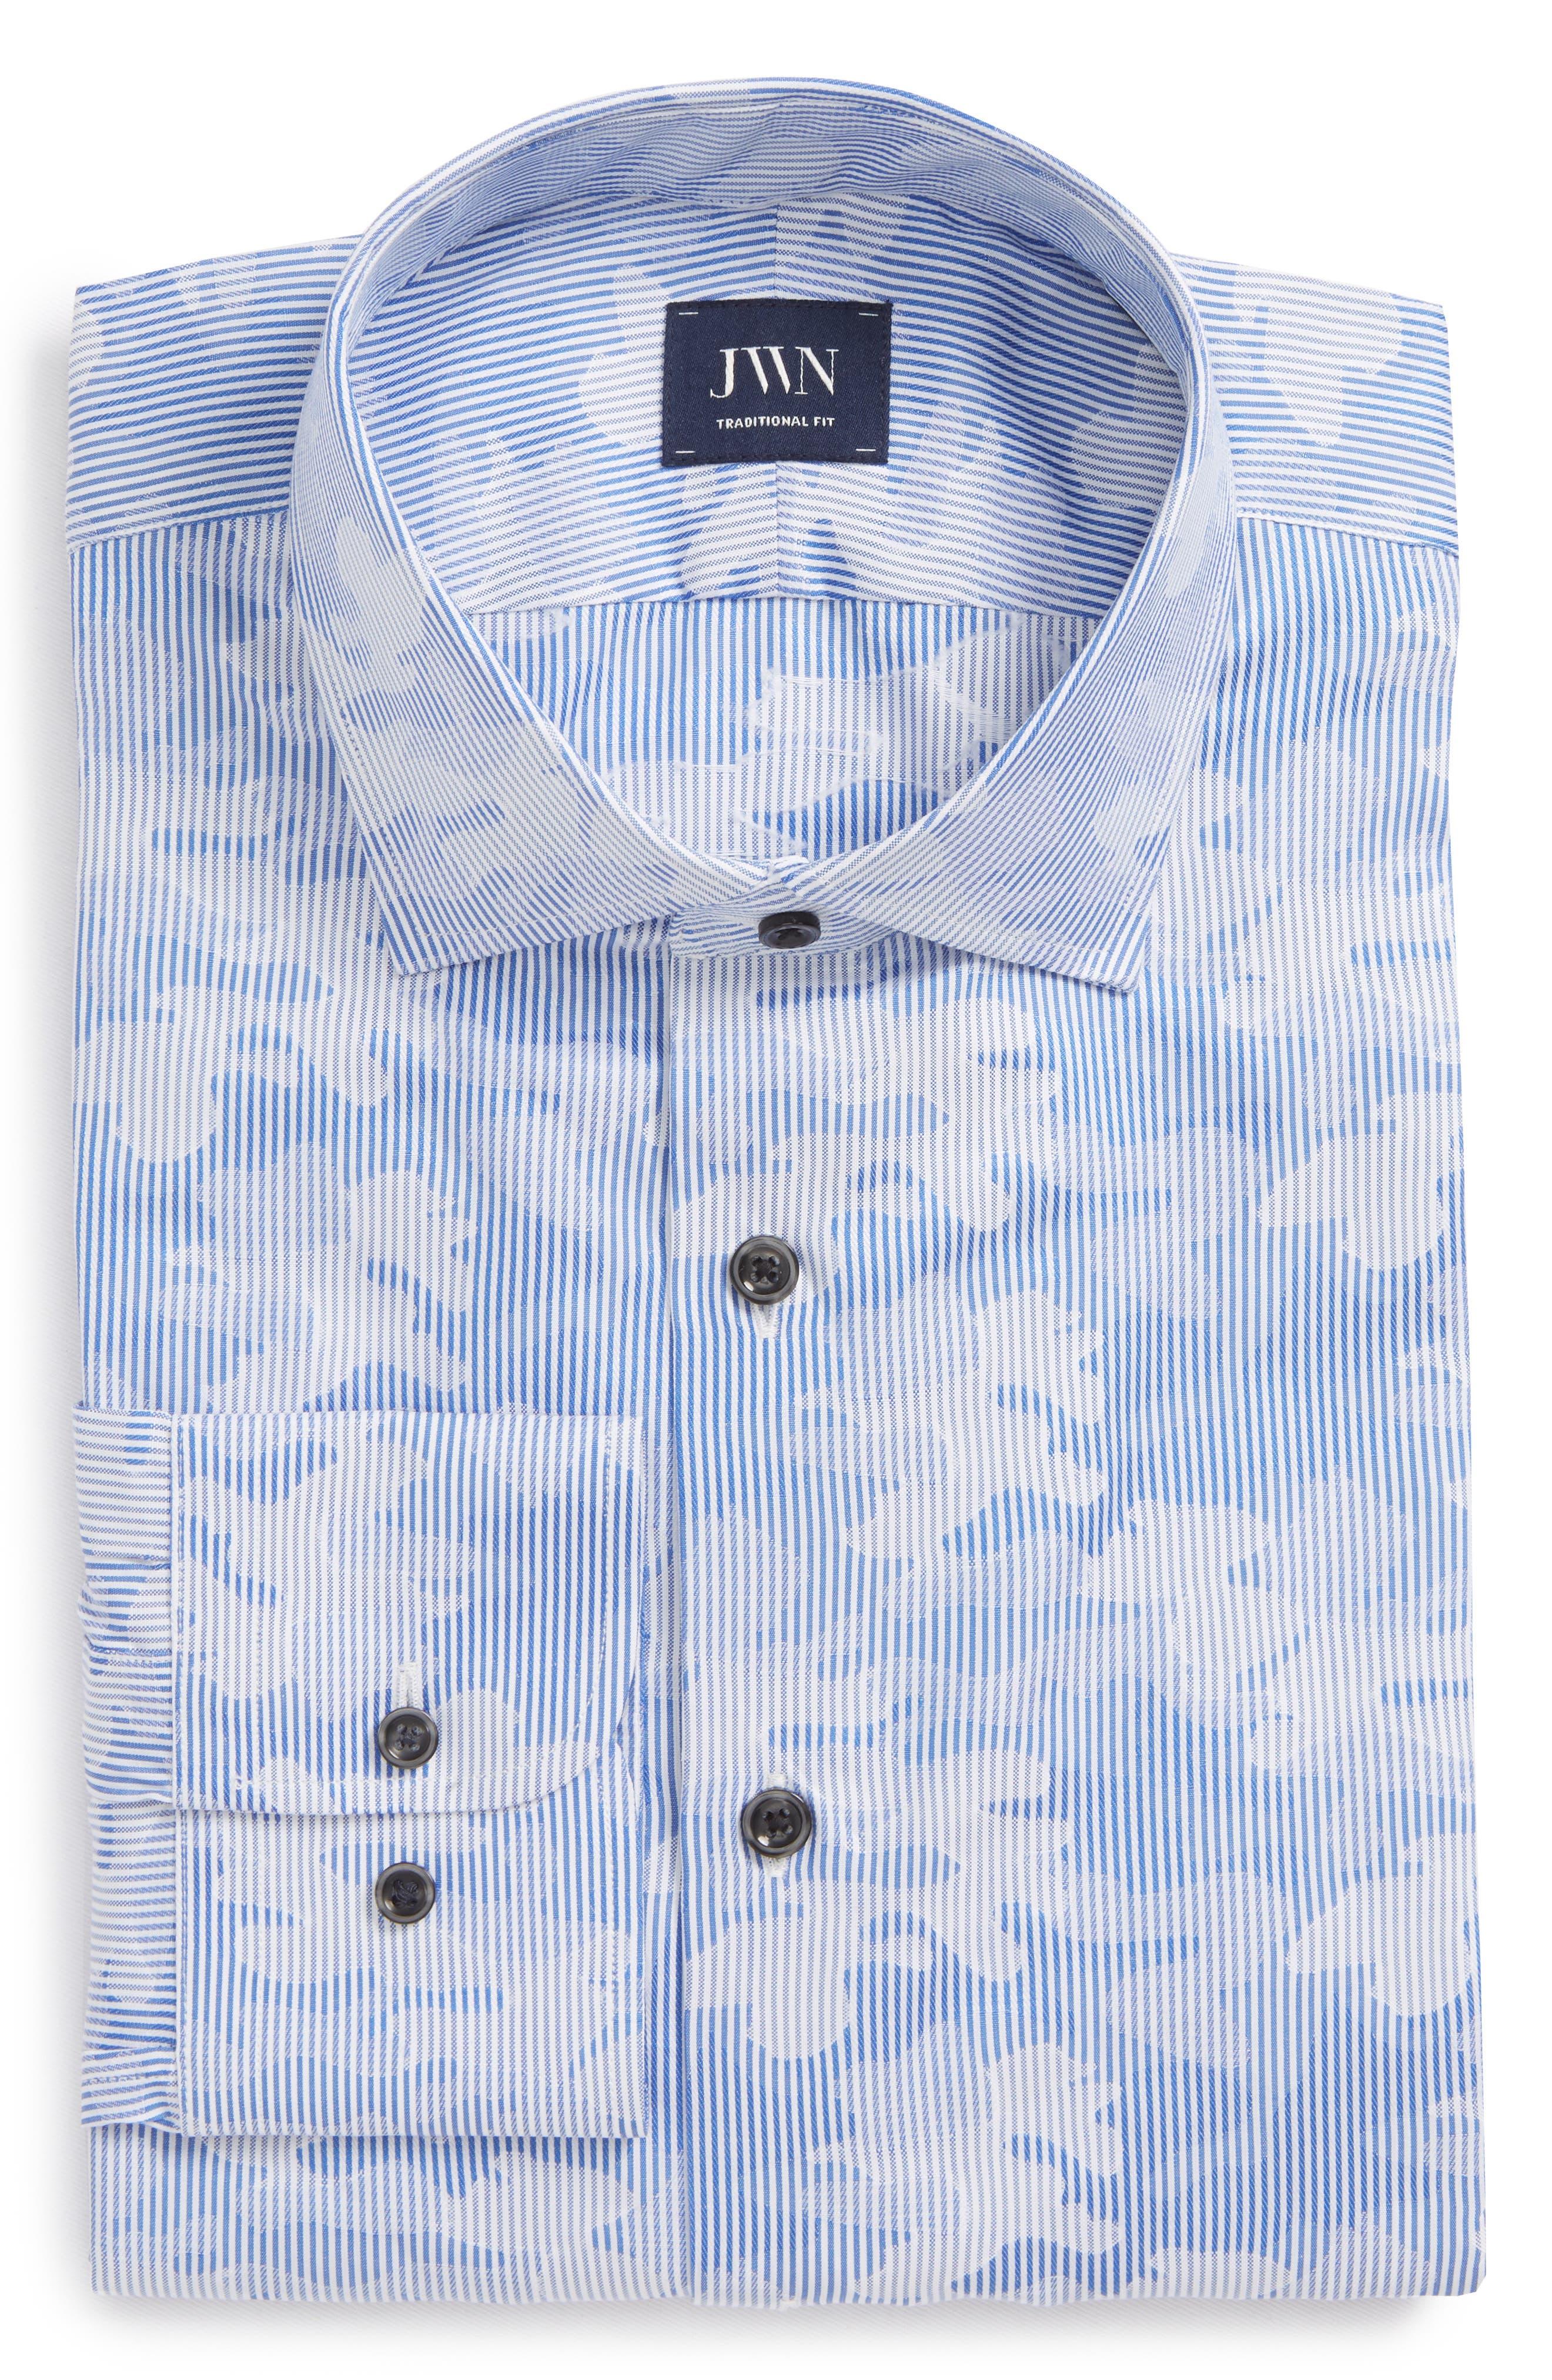 John W. Nordstrom® Traditional Fit Camo Dress Shirt